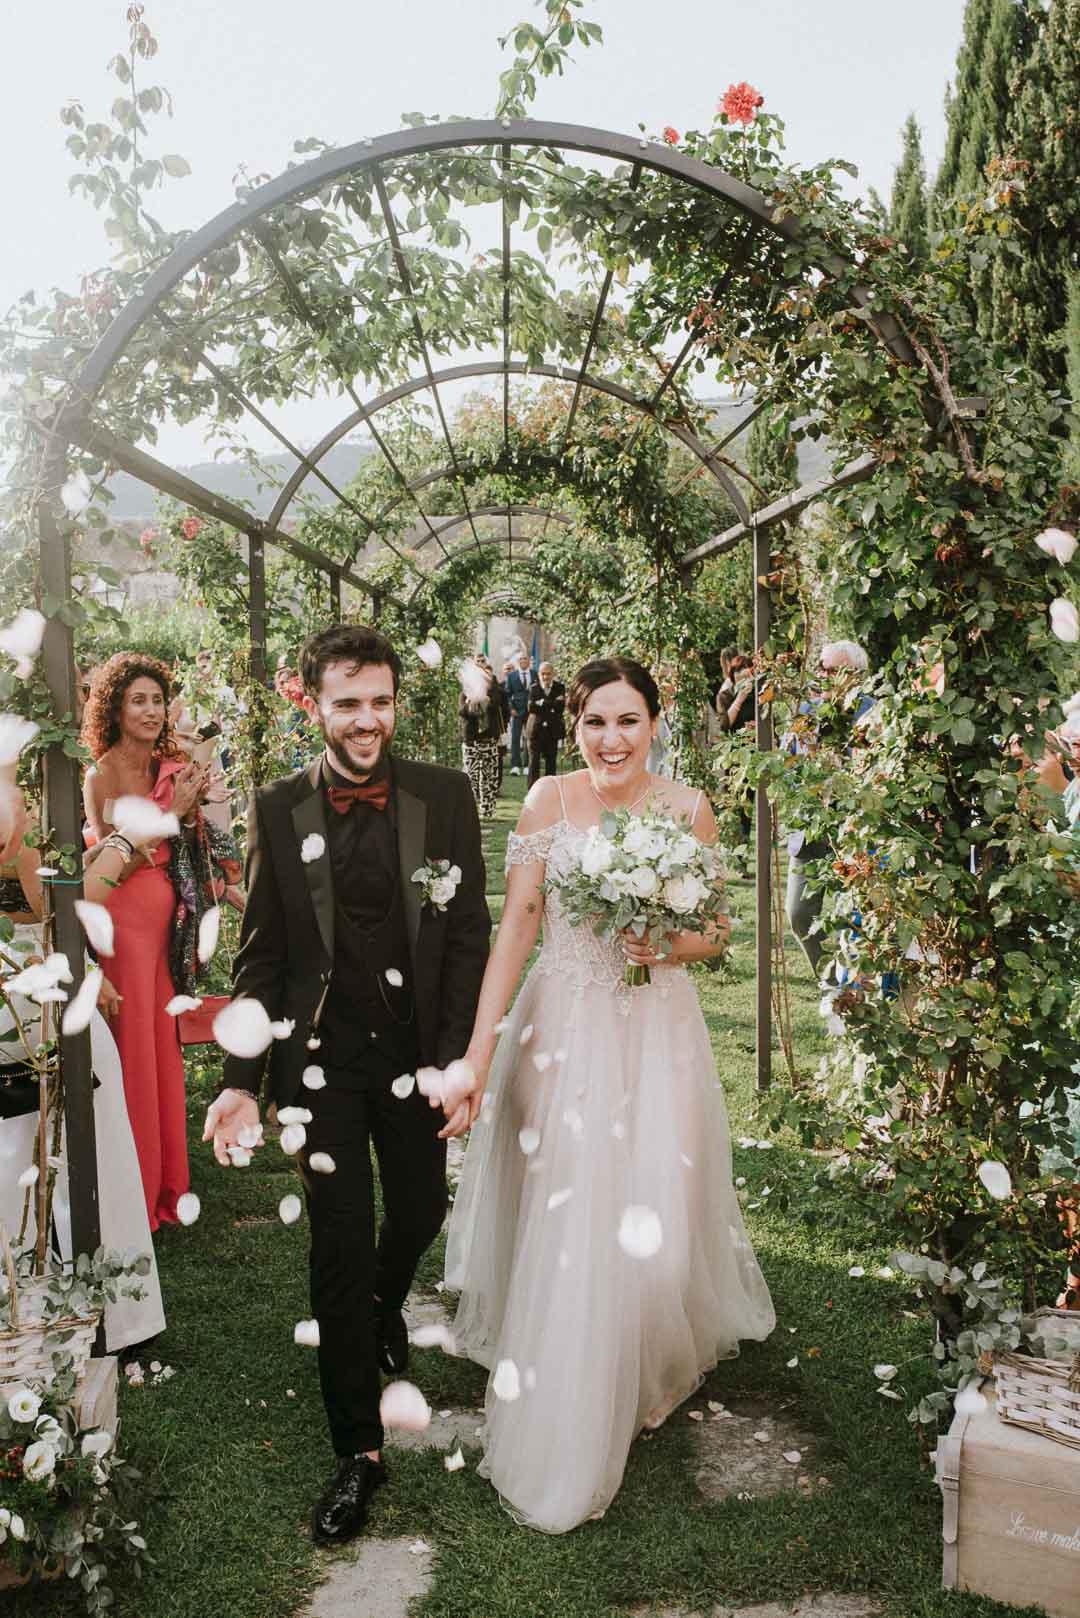 wedding-photographer-destination-fineart-bespoke-reportage-tuscany-villascorzi-vivianeizzo-spazio46-87